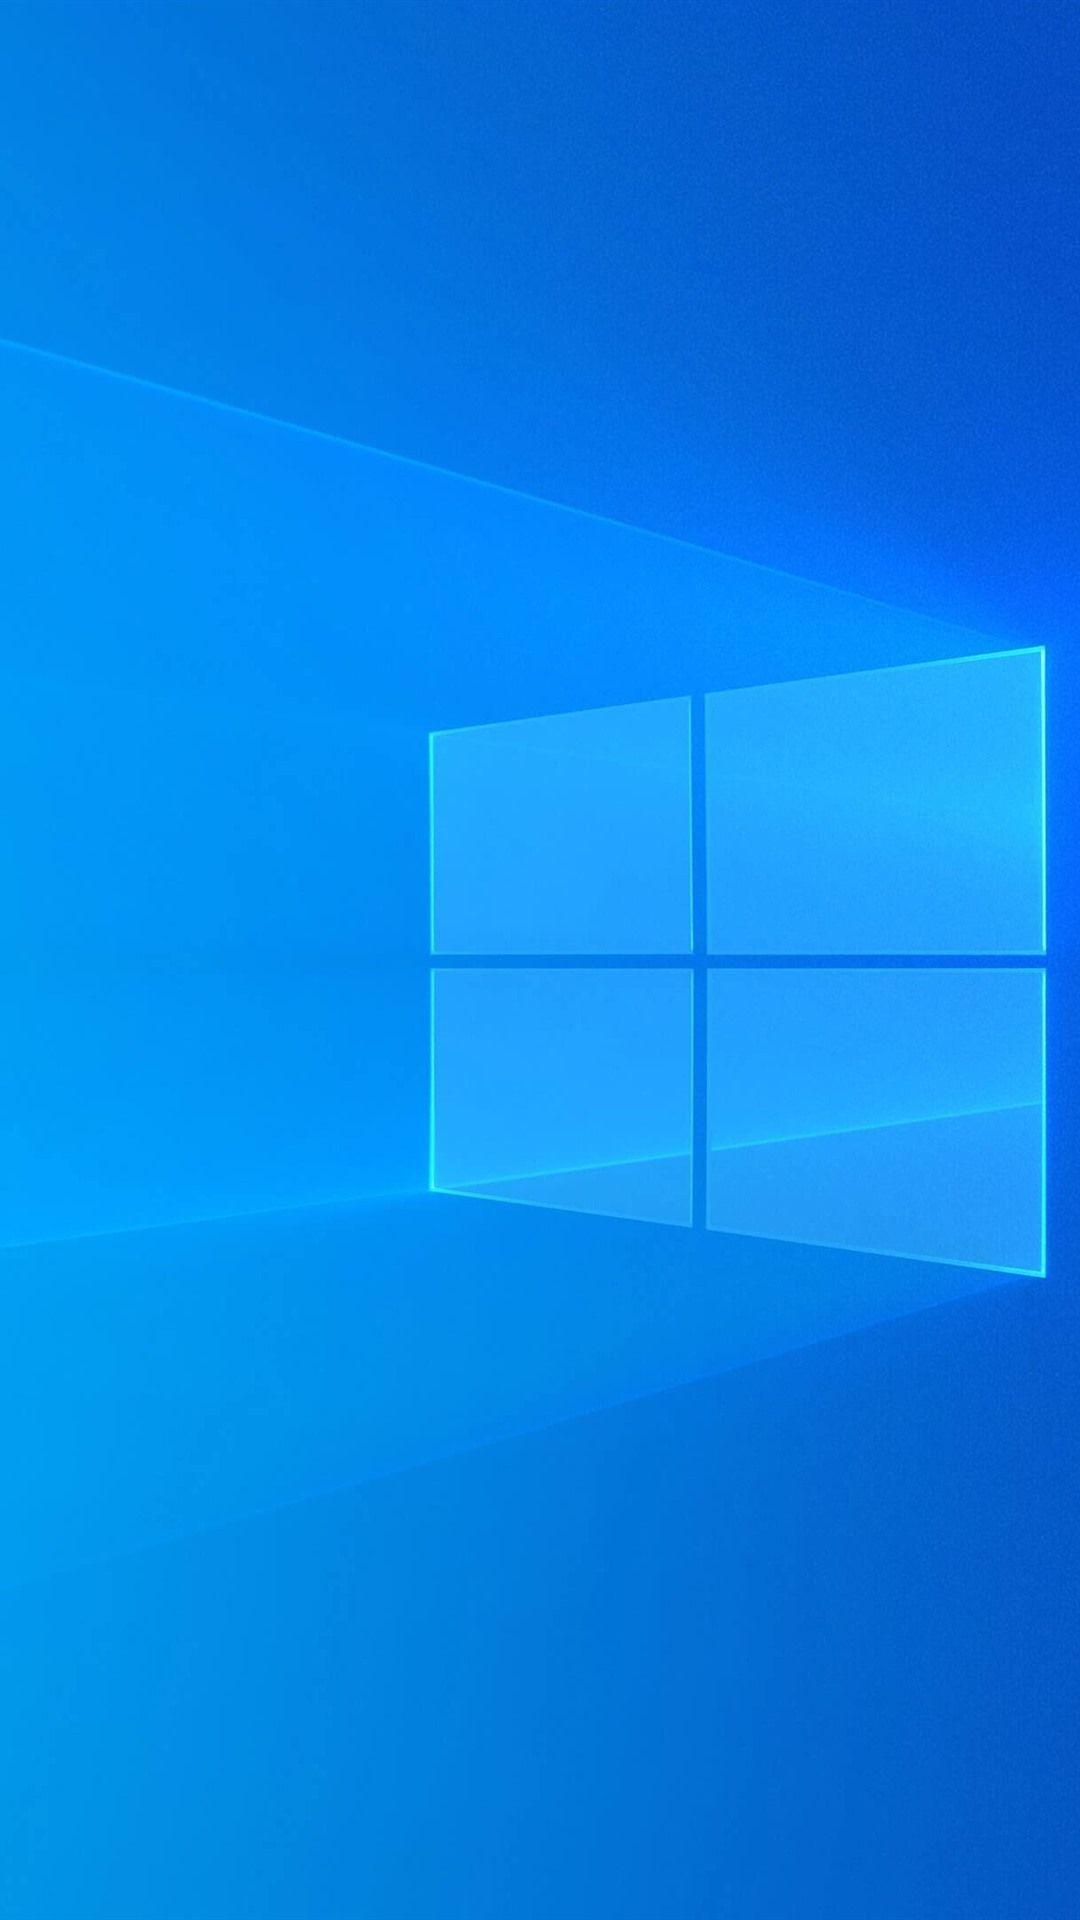 Black Windows 10 Desktop Wallpapers Backgrounds Wallpaper Windows